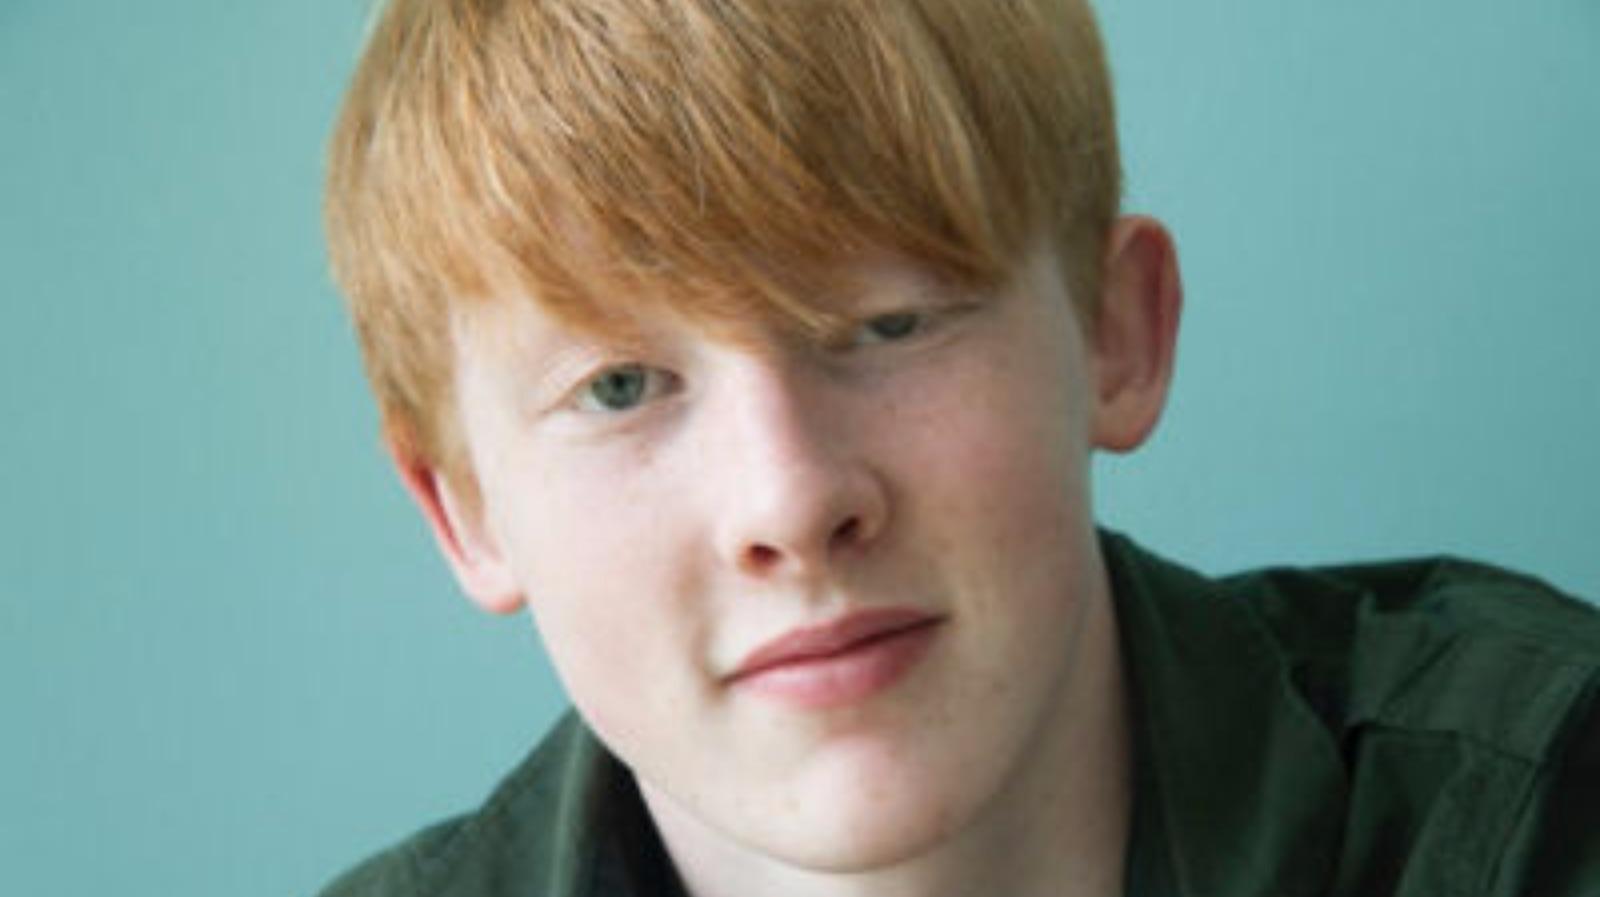 Teen who killed Bailey Gwynne sentenced to nine years - ITV News